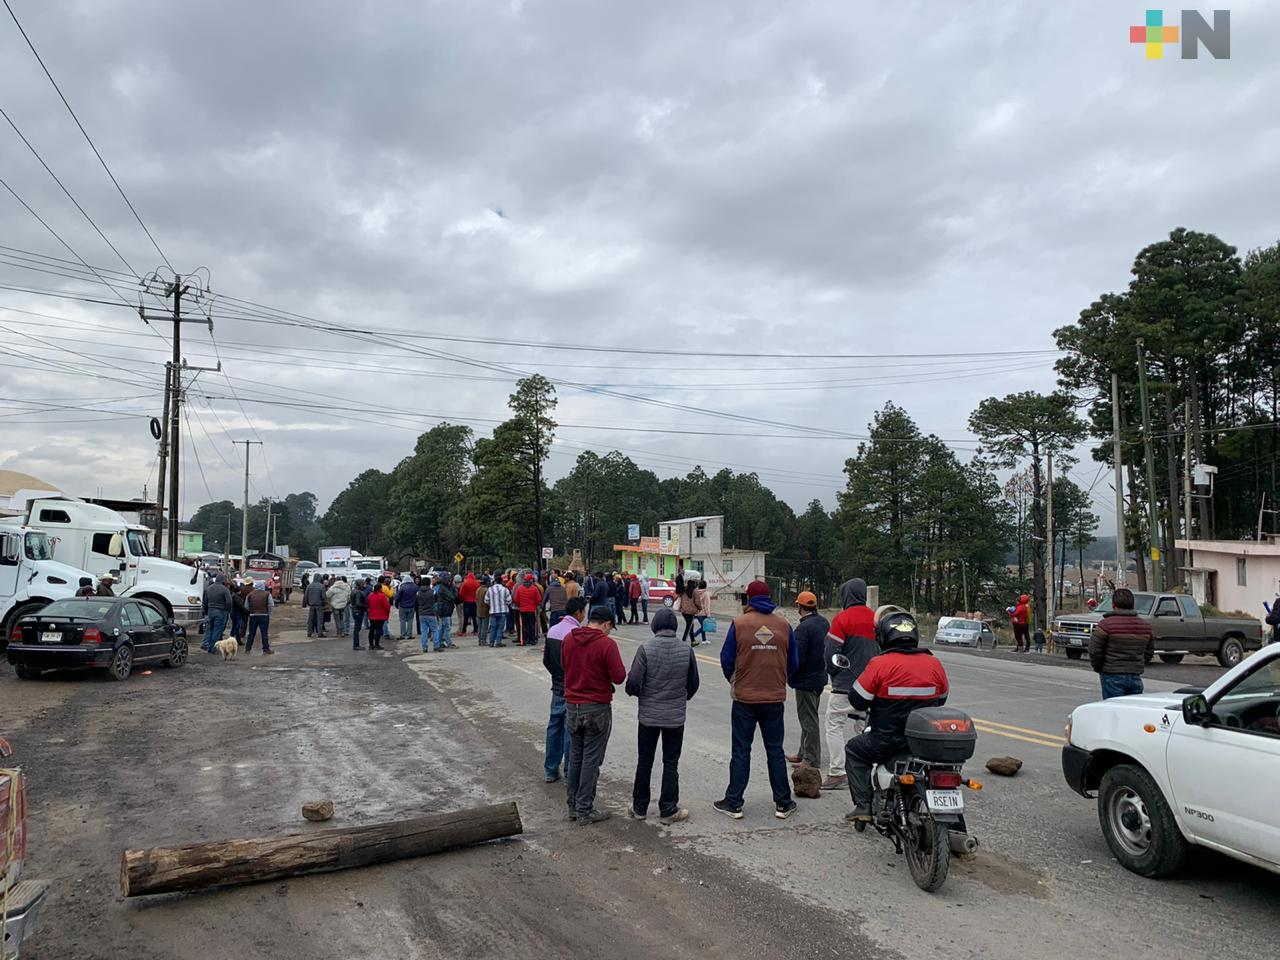 Continúa tomada la carretera Xalapa-Perote